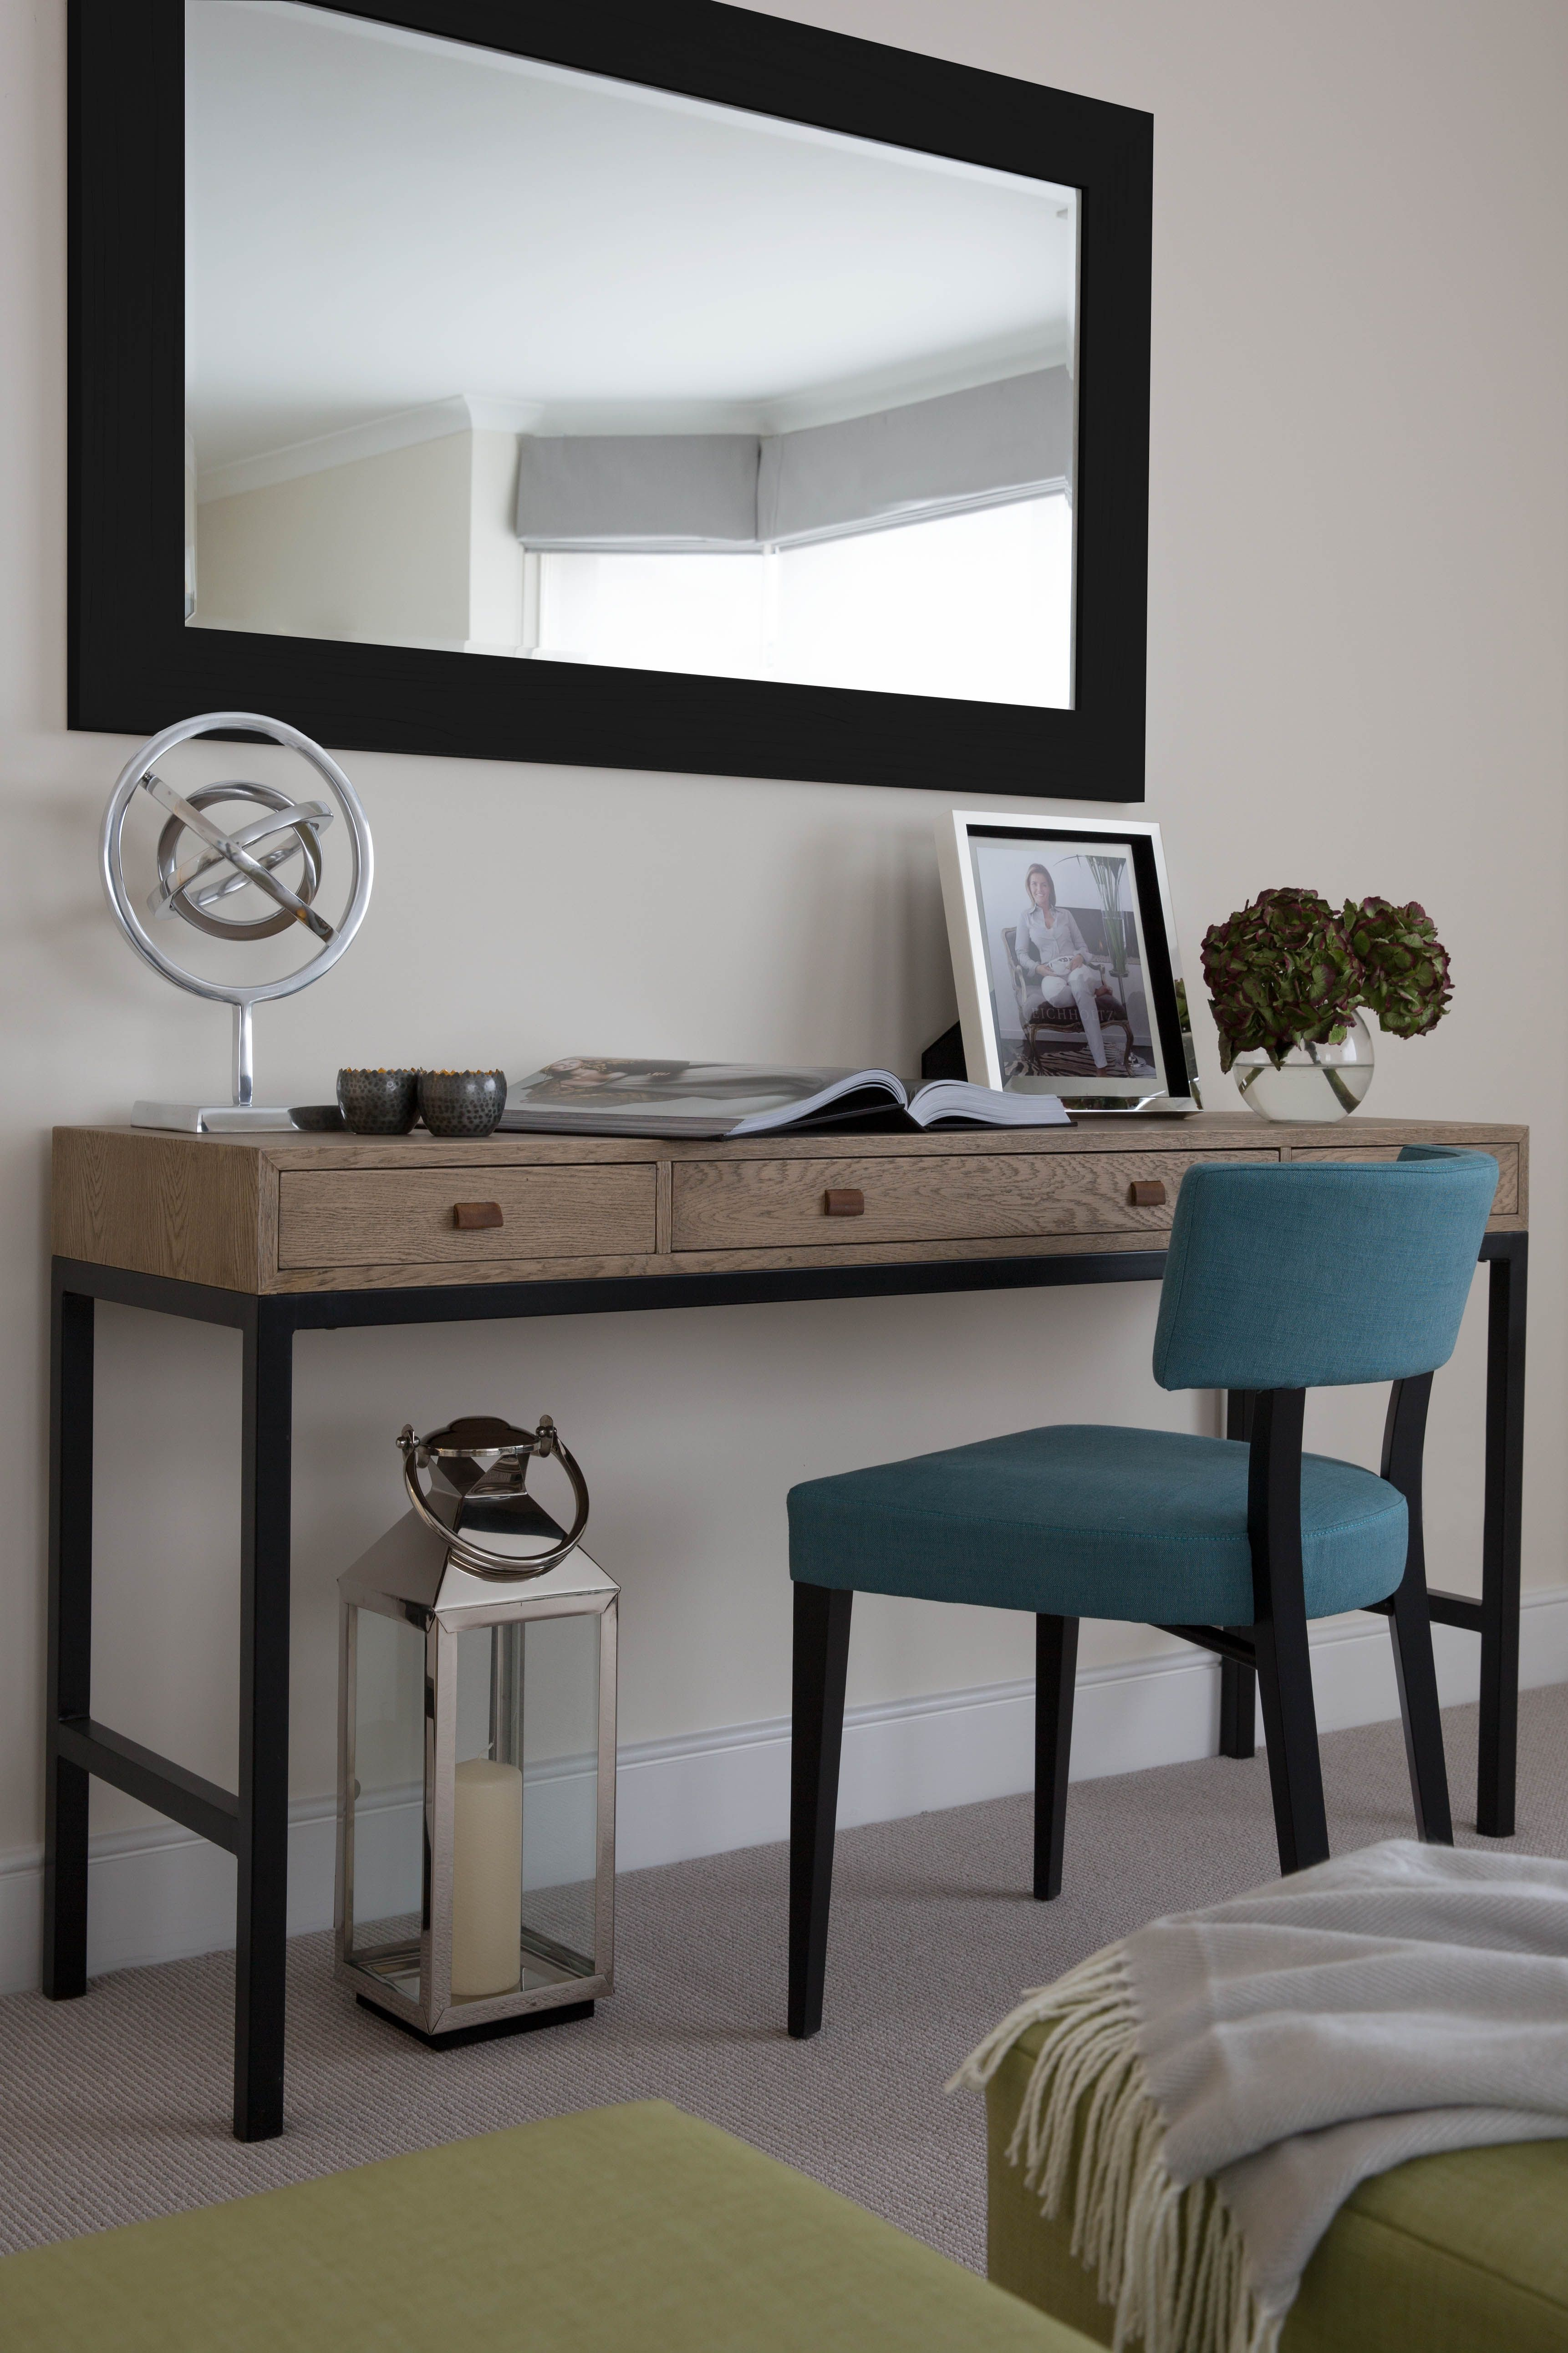 Th2 Designs 169 Candle Desk Mirror Chair Interior Design Th2design Pinterest